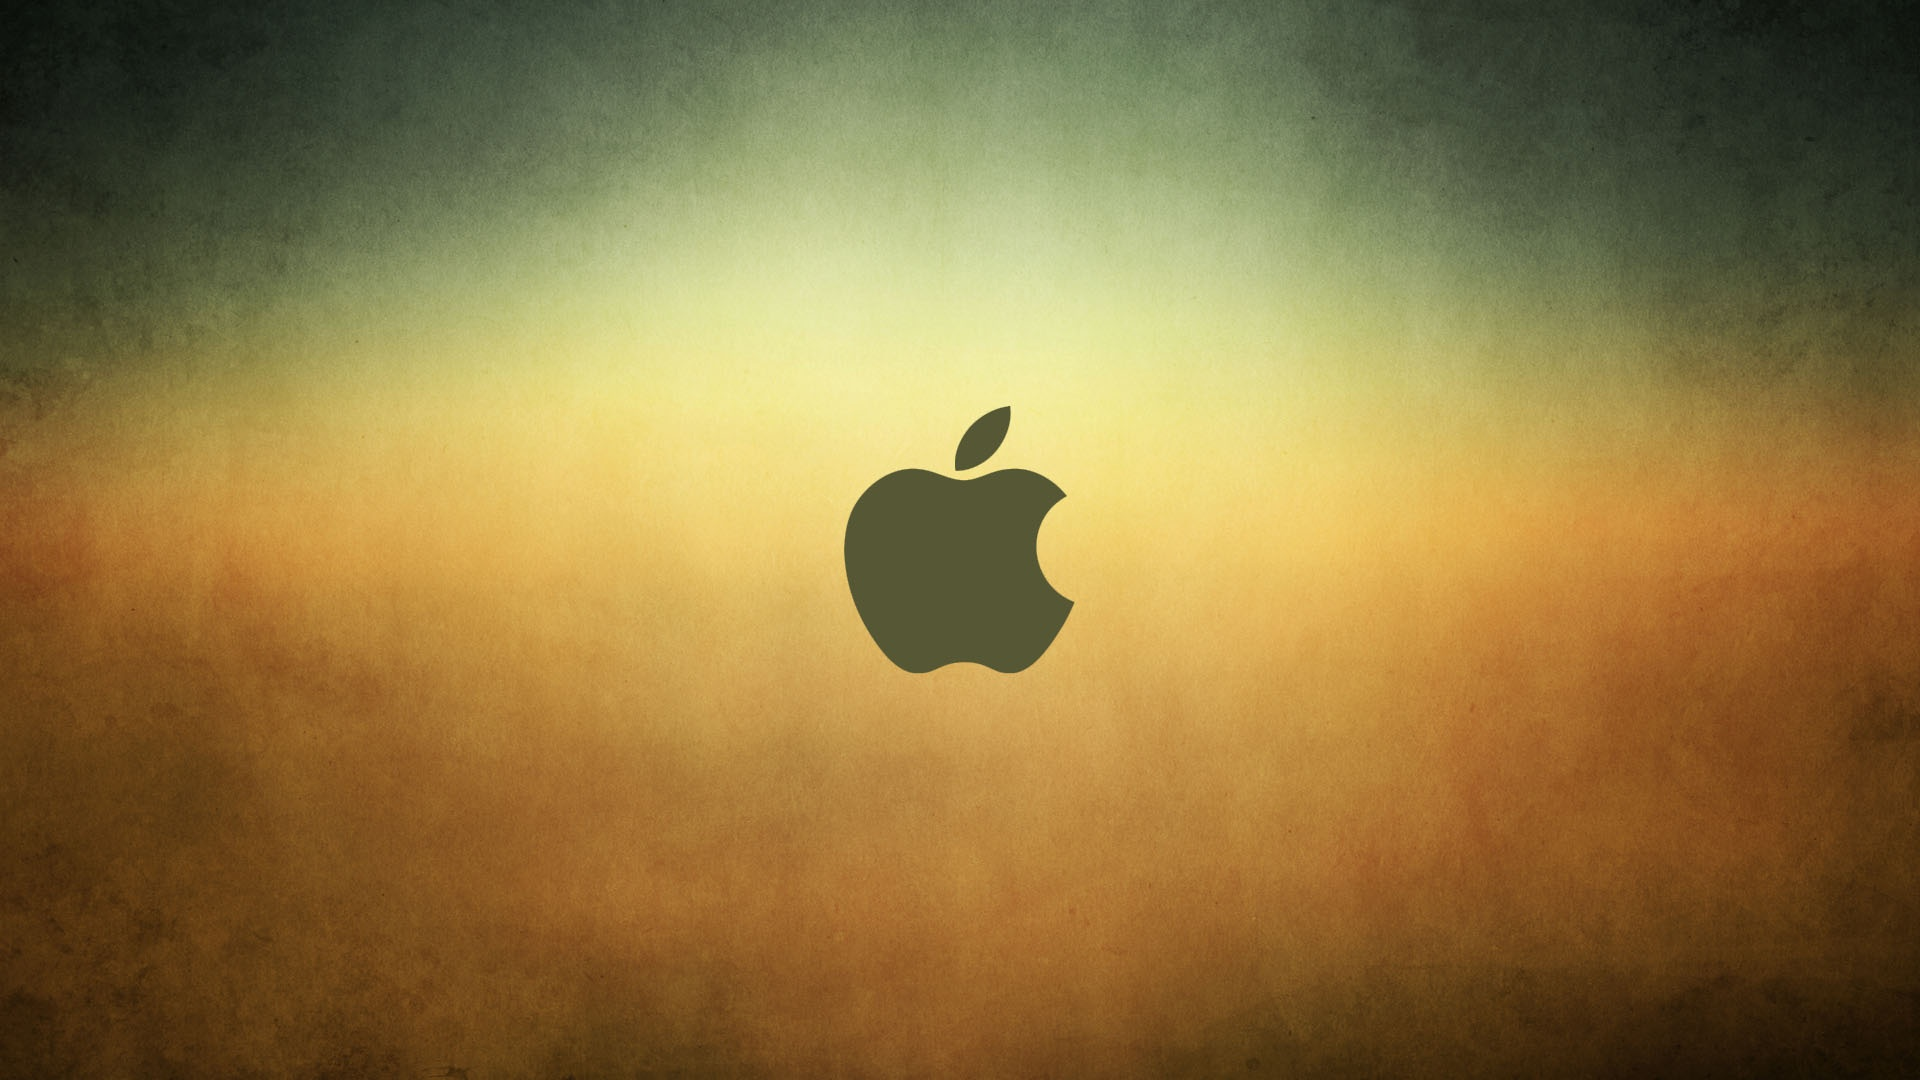 Get How Do I Download Apple Desktop Photos Gif